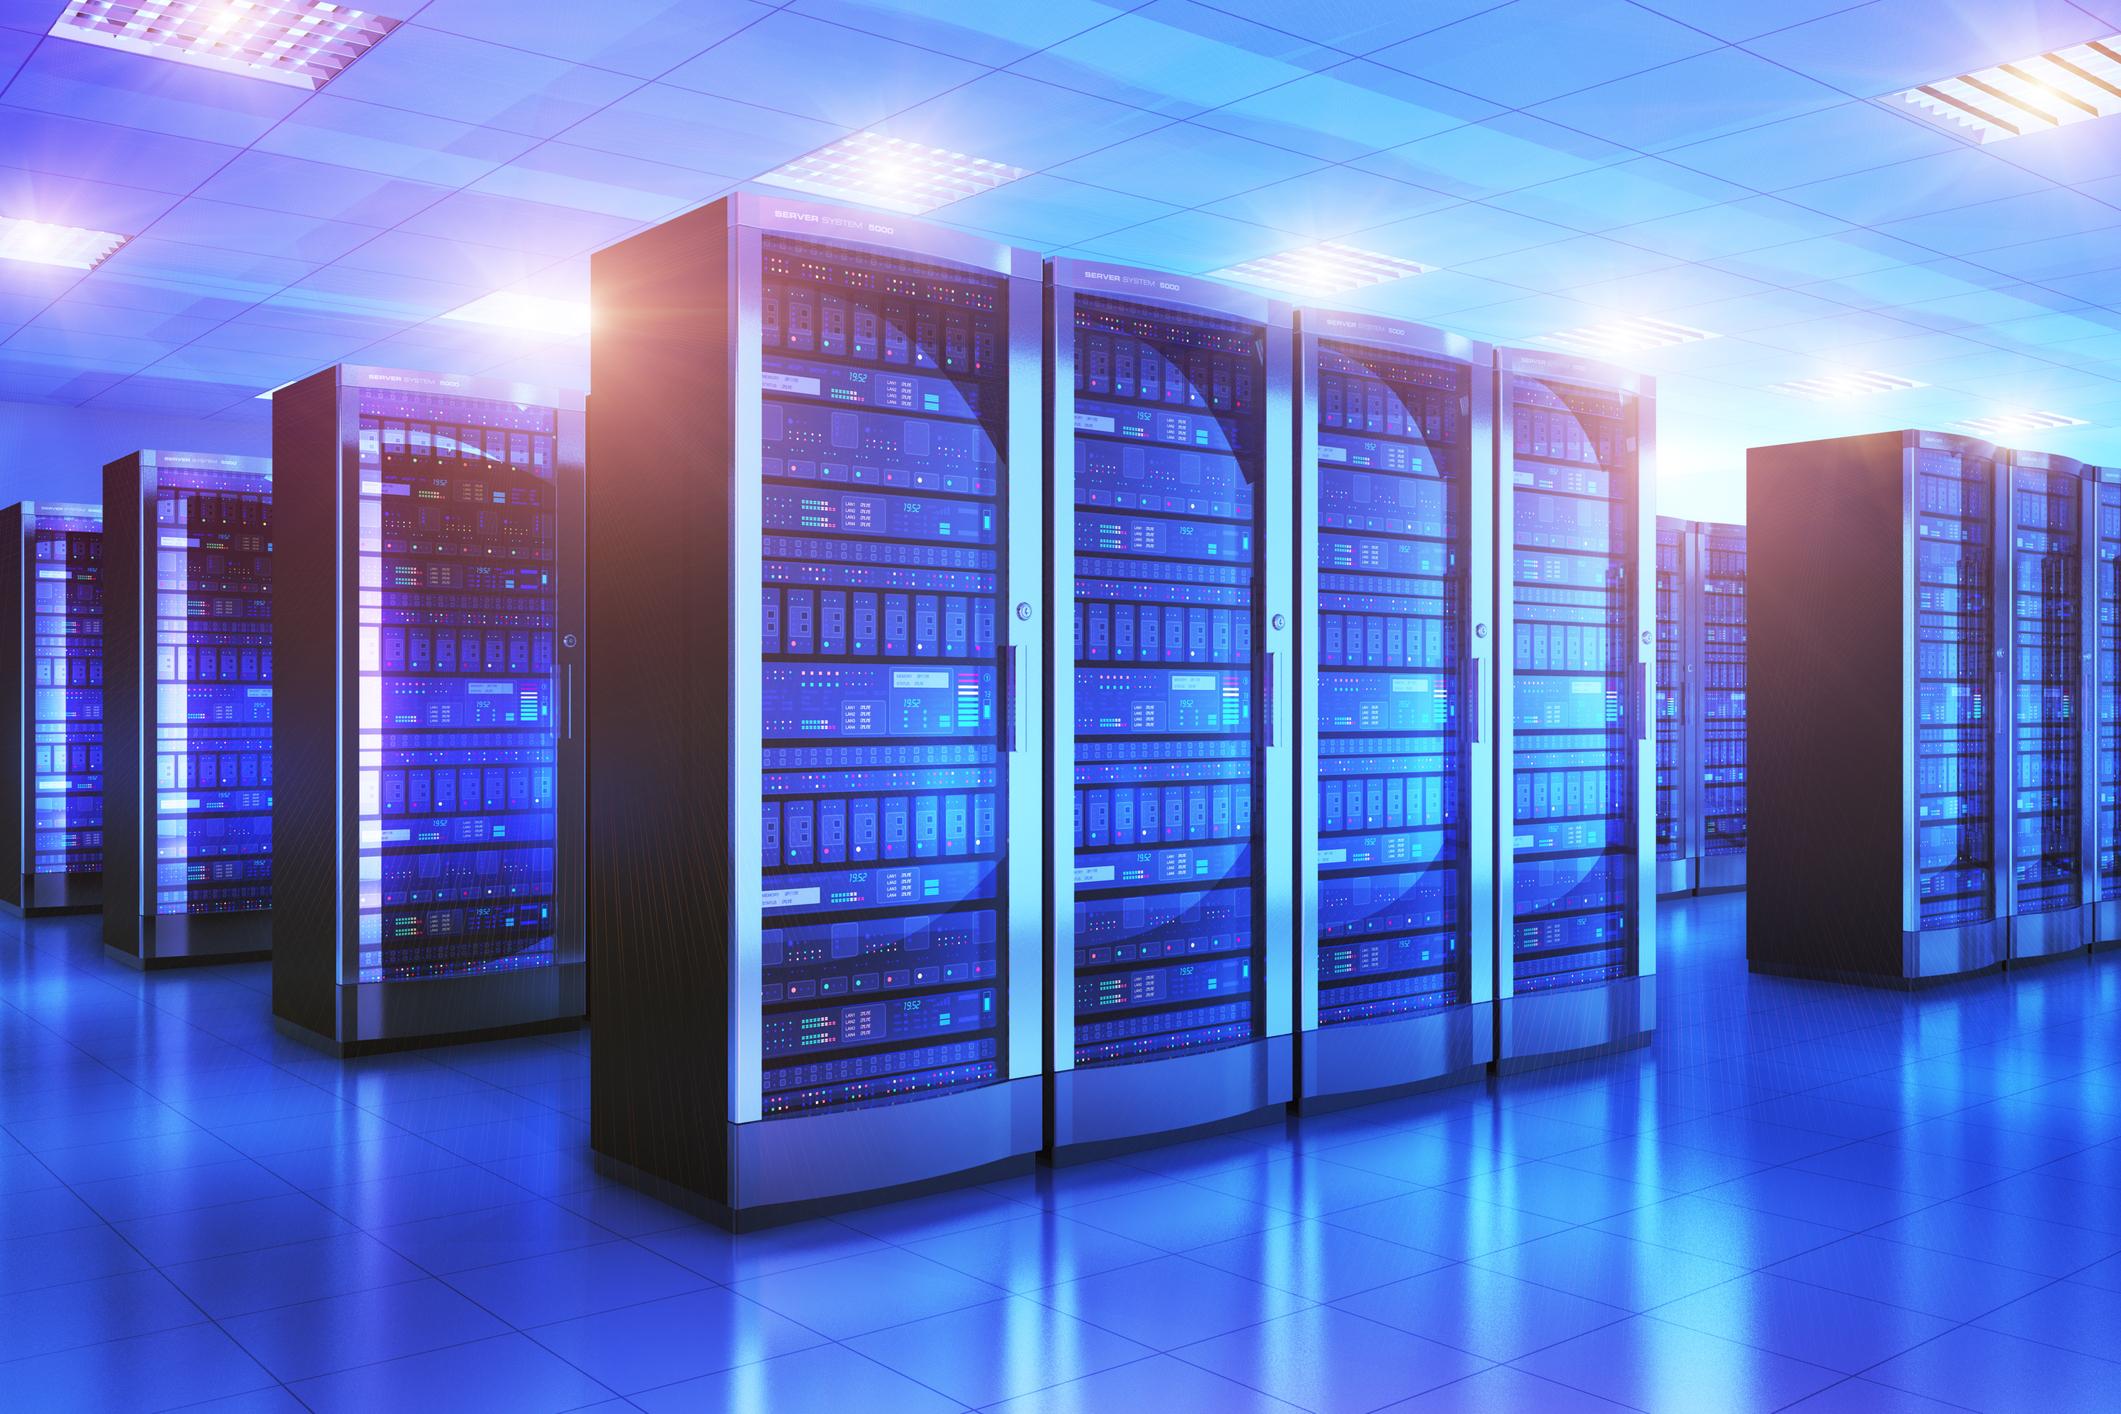 Data center computer banks for powering cloud computing.